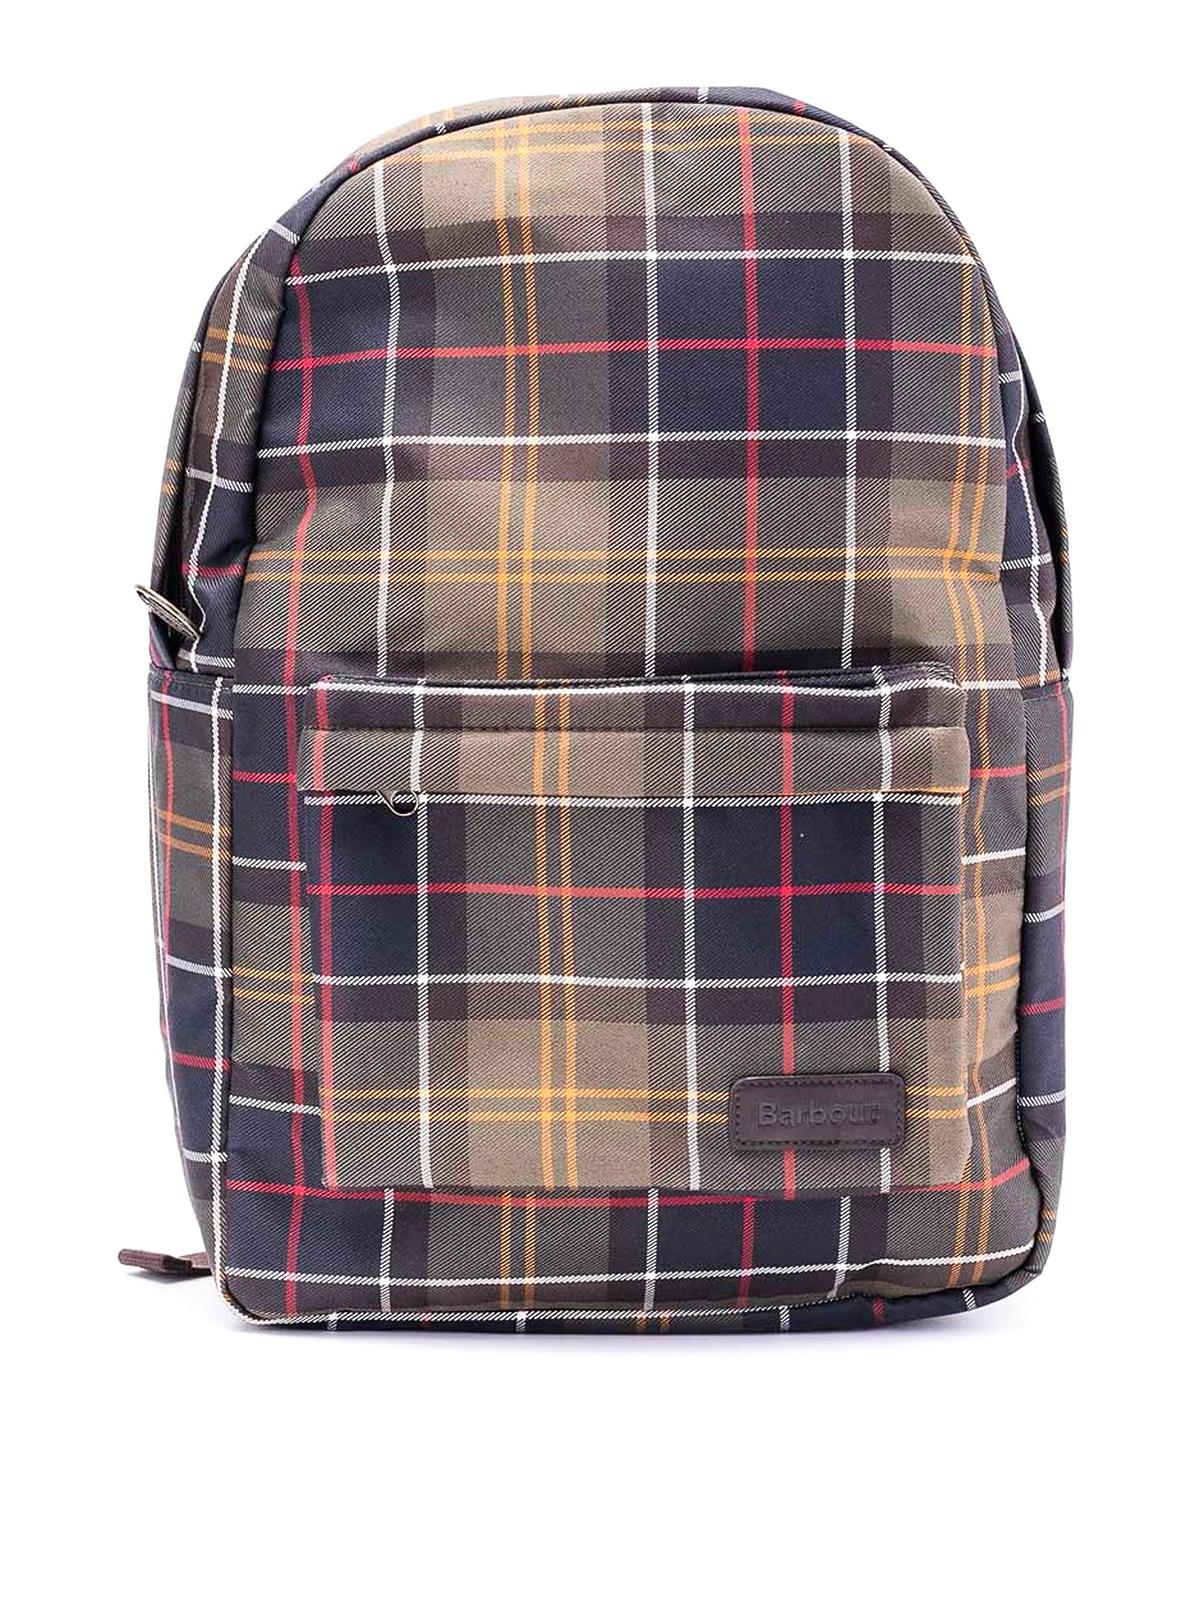 Barbour Torridon Backpack In Multicolour